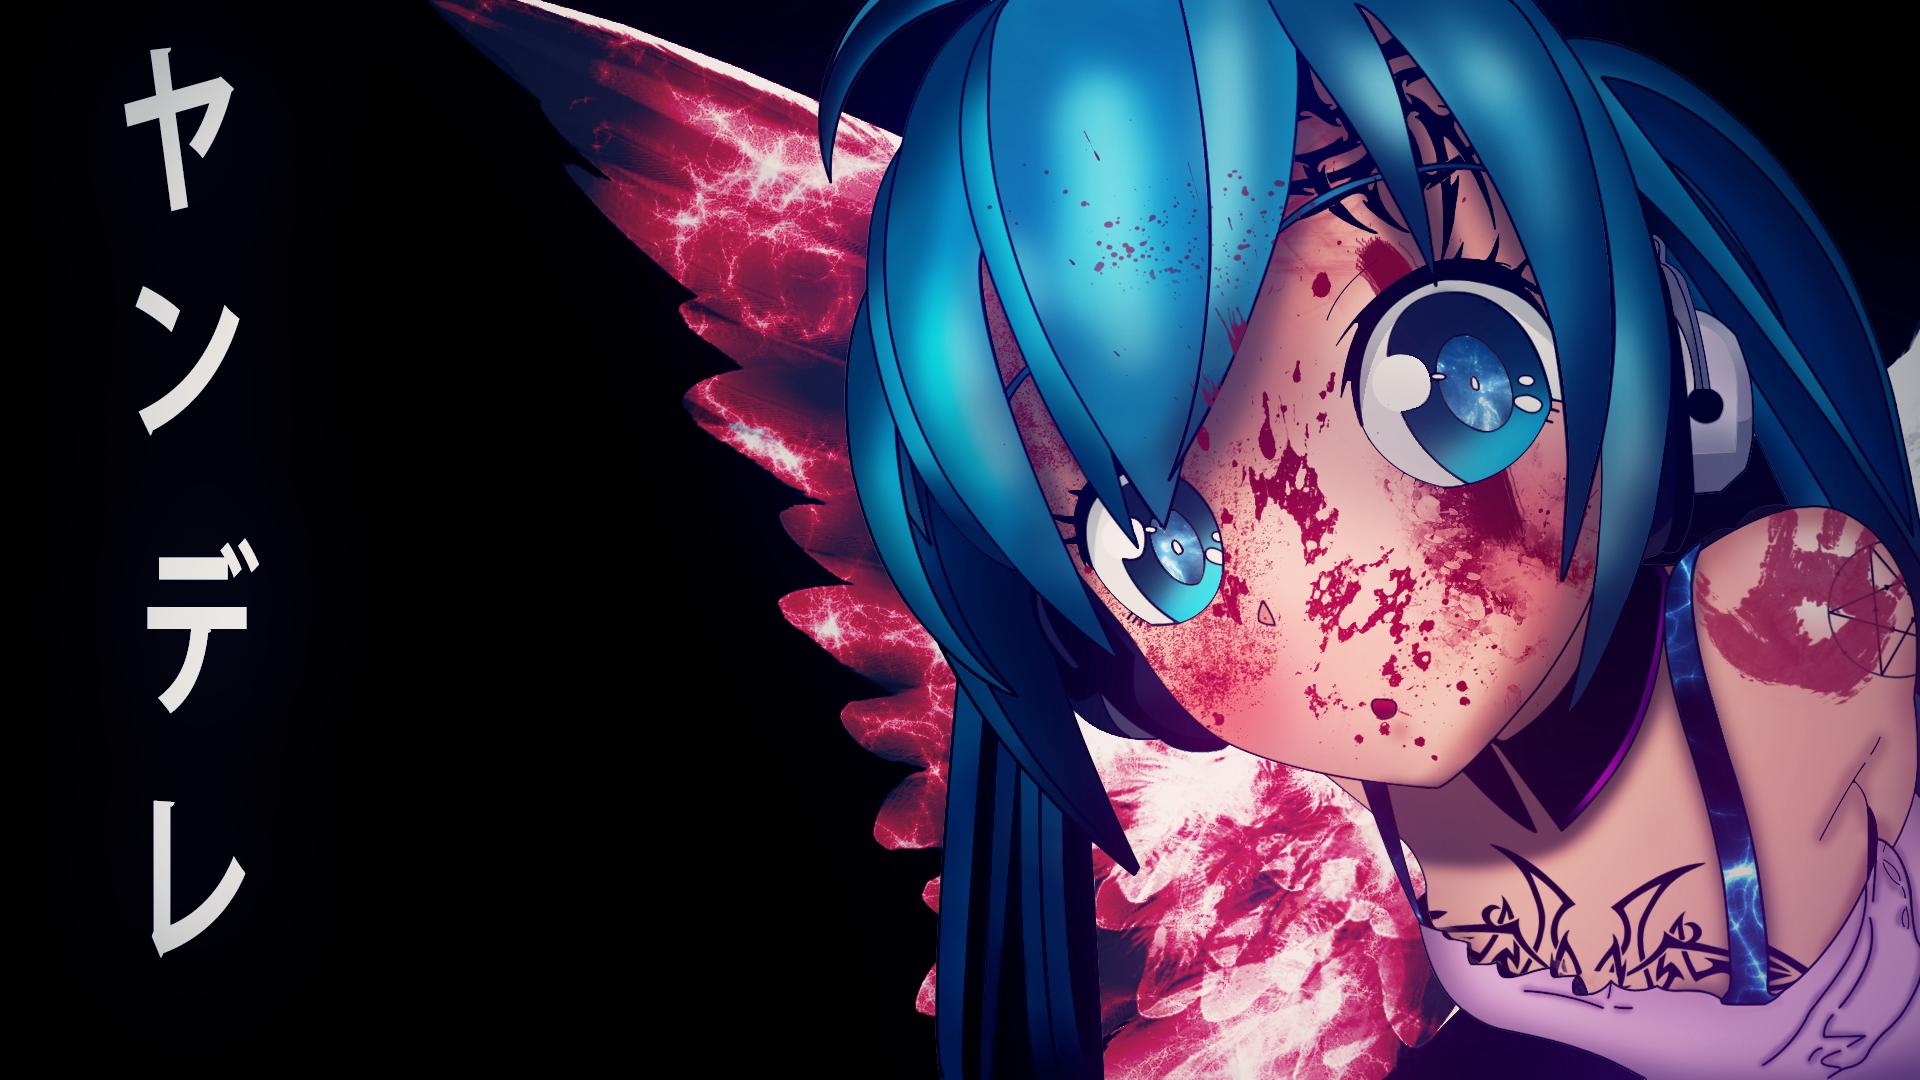 Miku Hatsune Yandere By DrawingAnimes4Fun